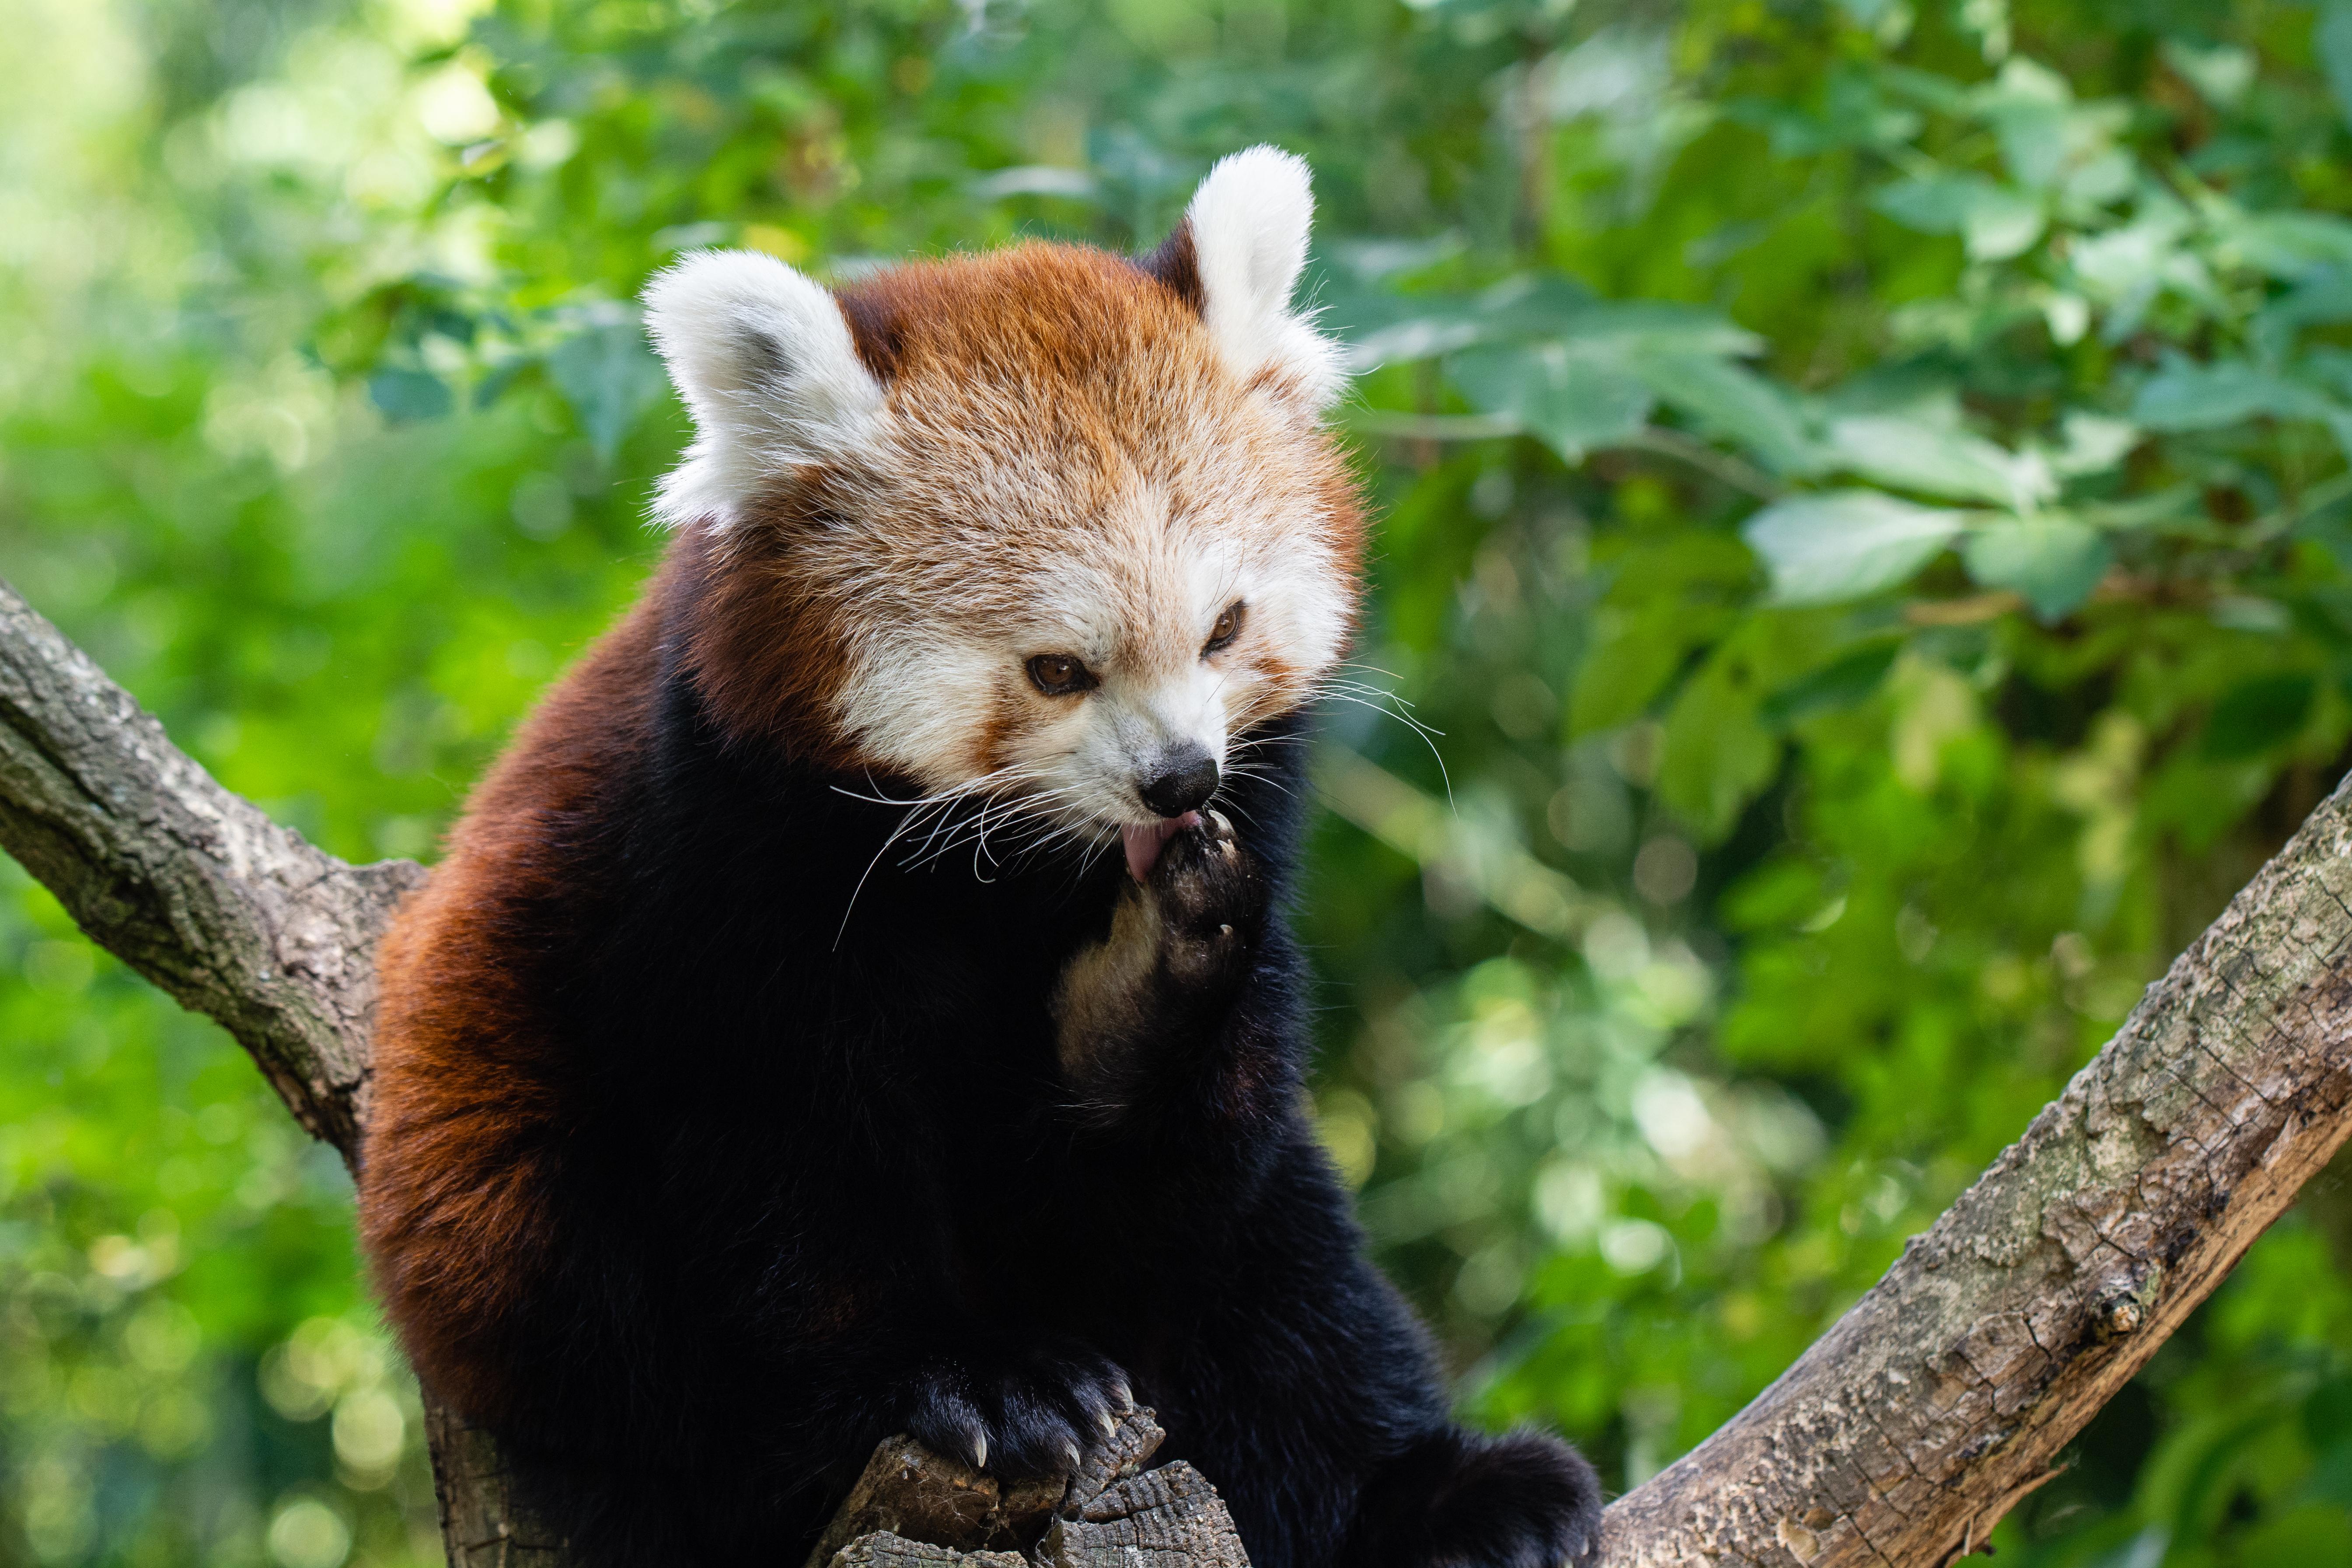 112364 download wallpaper Animals, Fiery Panda, Little Panda, Small Panda, Red Panda, Panda, Lick Your Lips, Licking screensavers and pictures for free